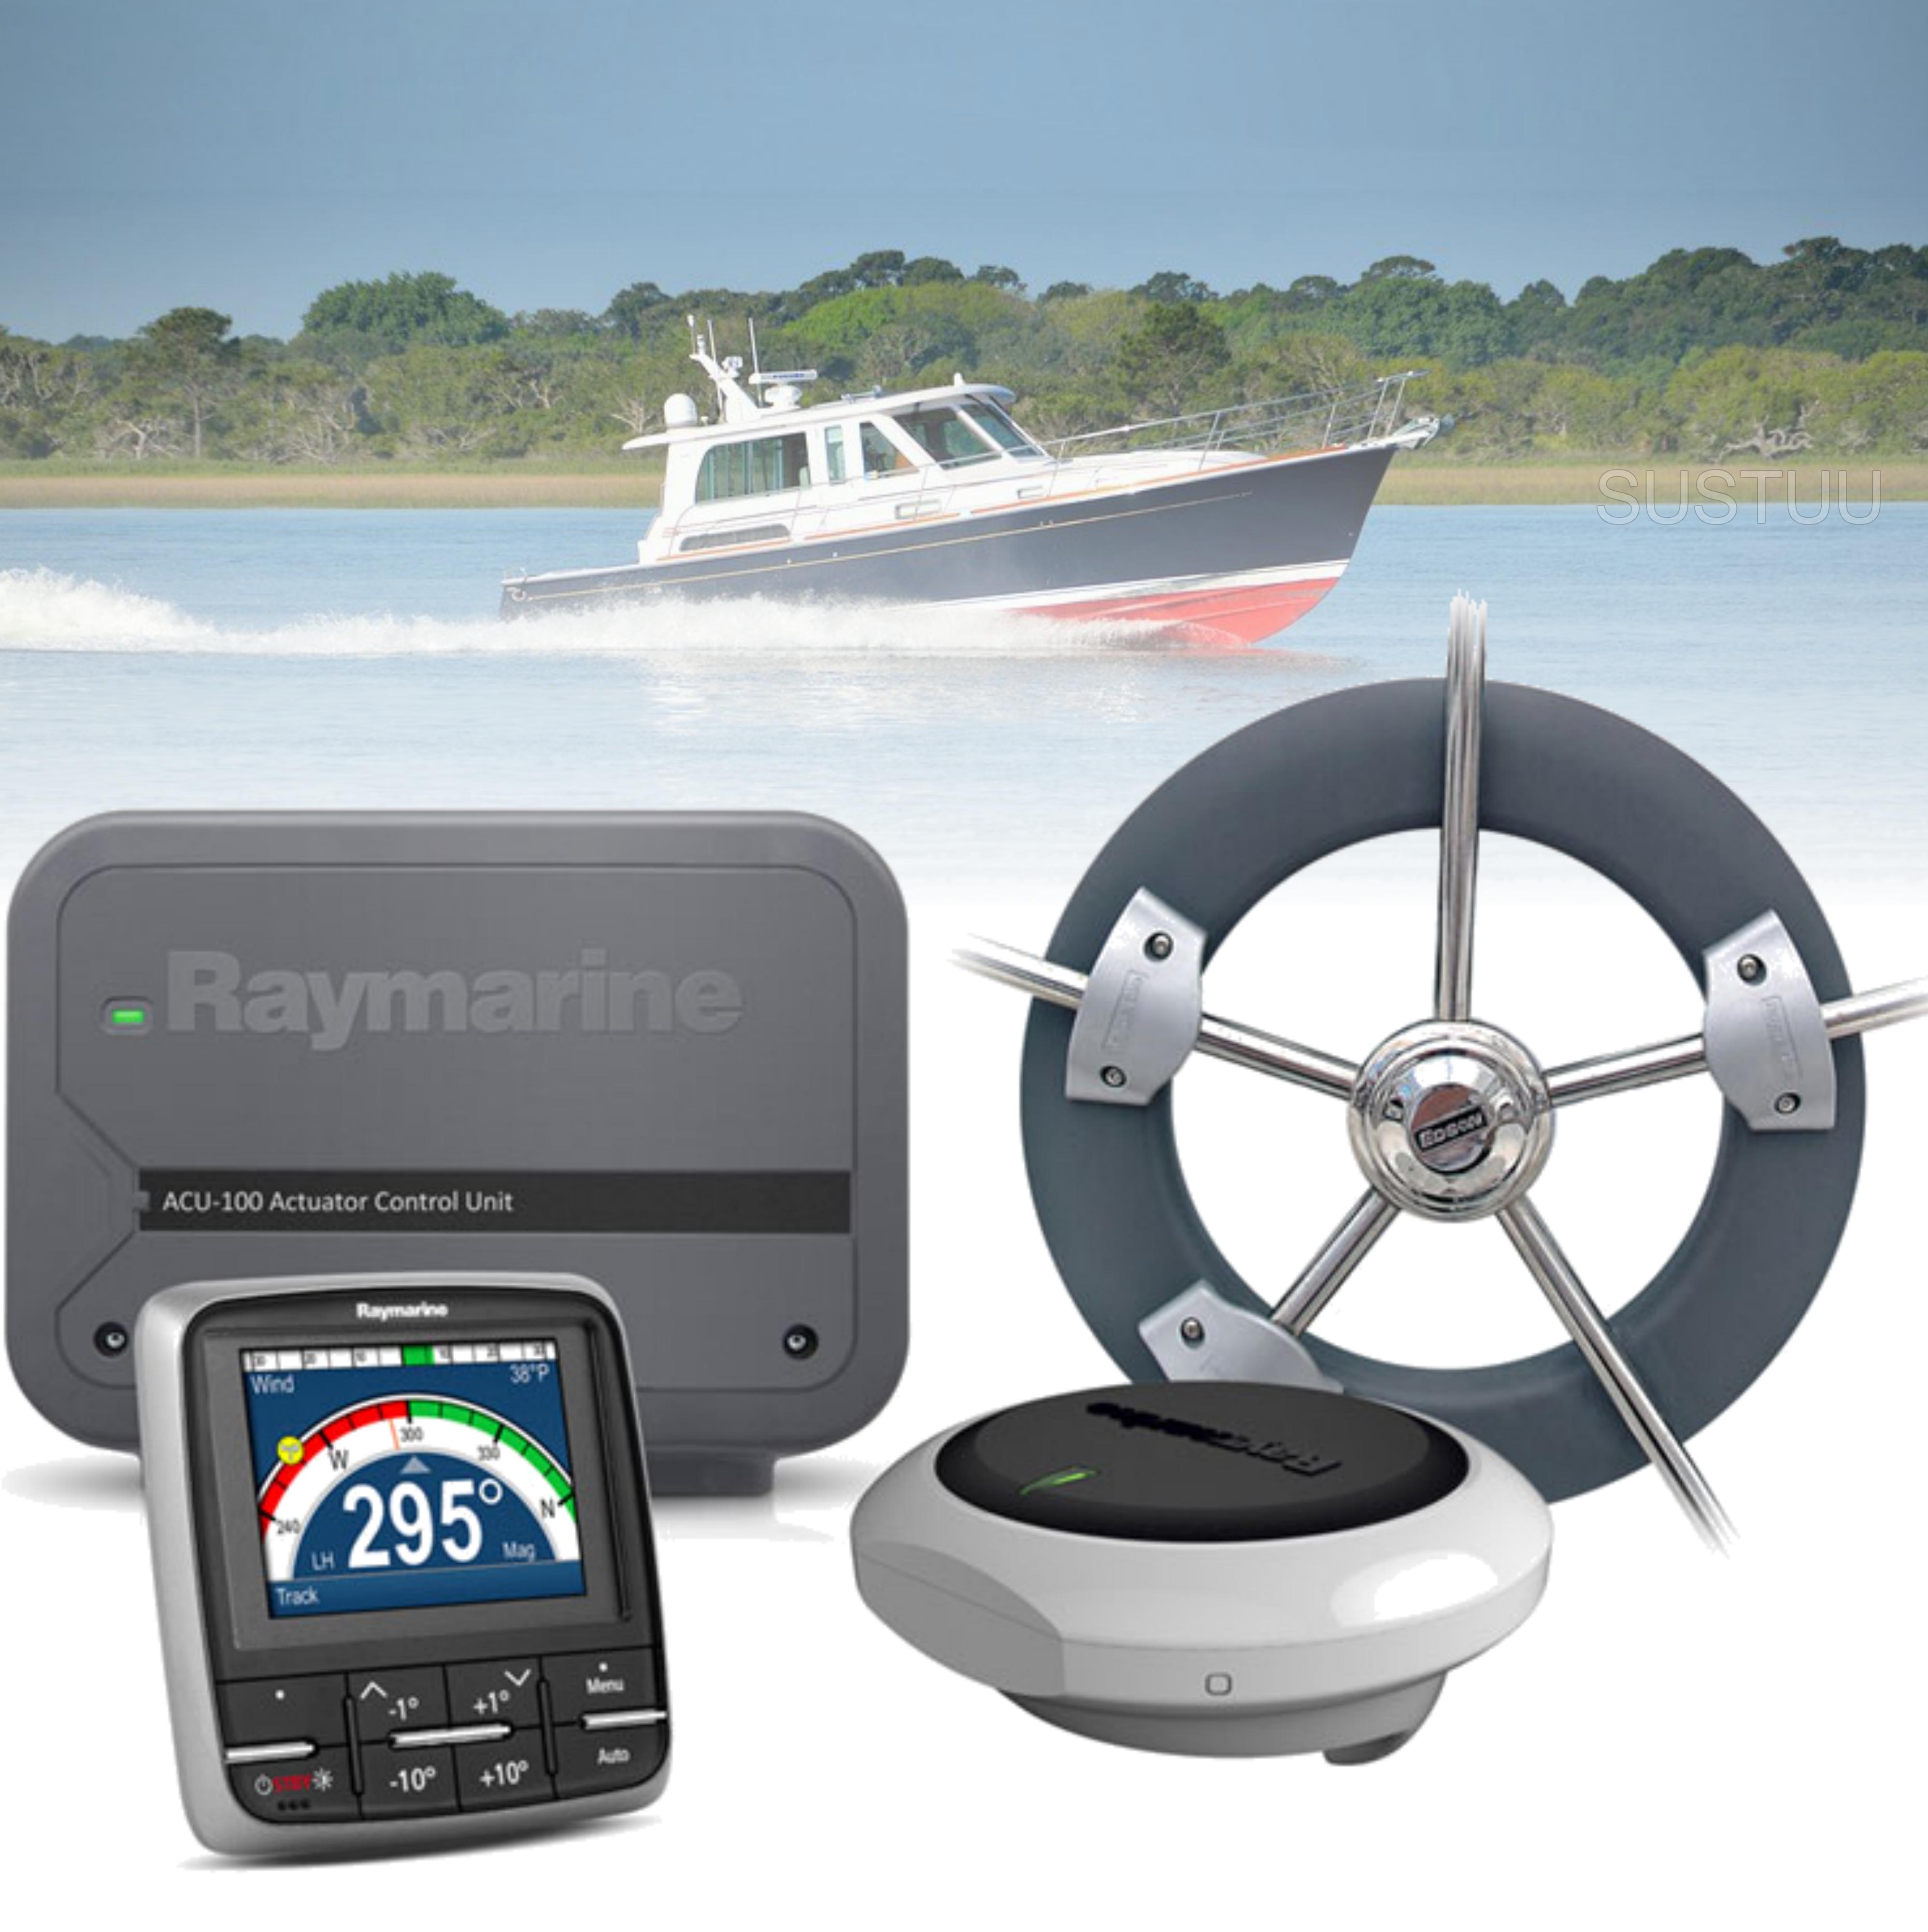 Raymarine Evolution Wheel Pilot|p70 Control Head|ACU-100 & Wheel Drive|In Marine